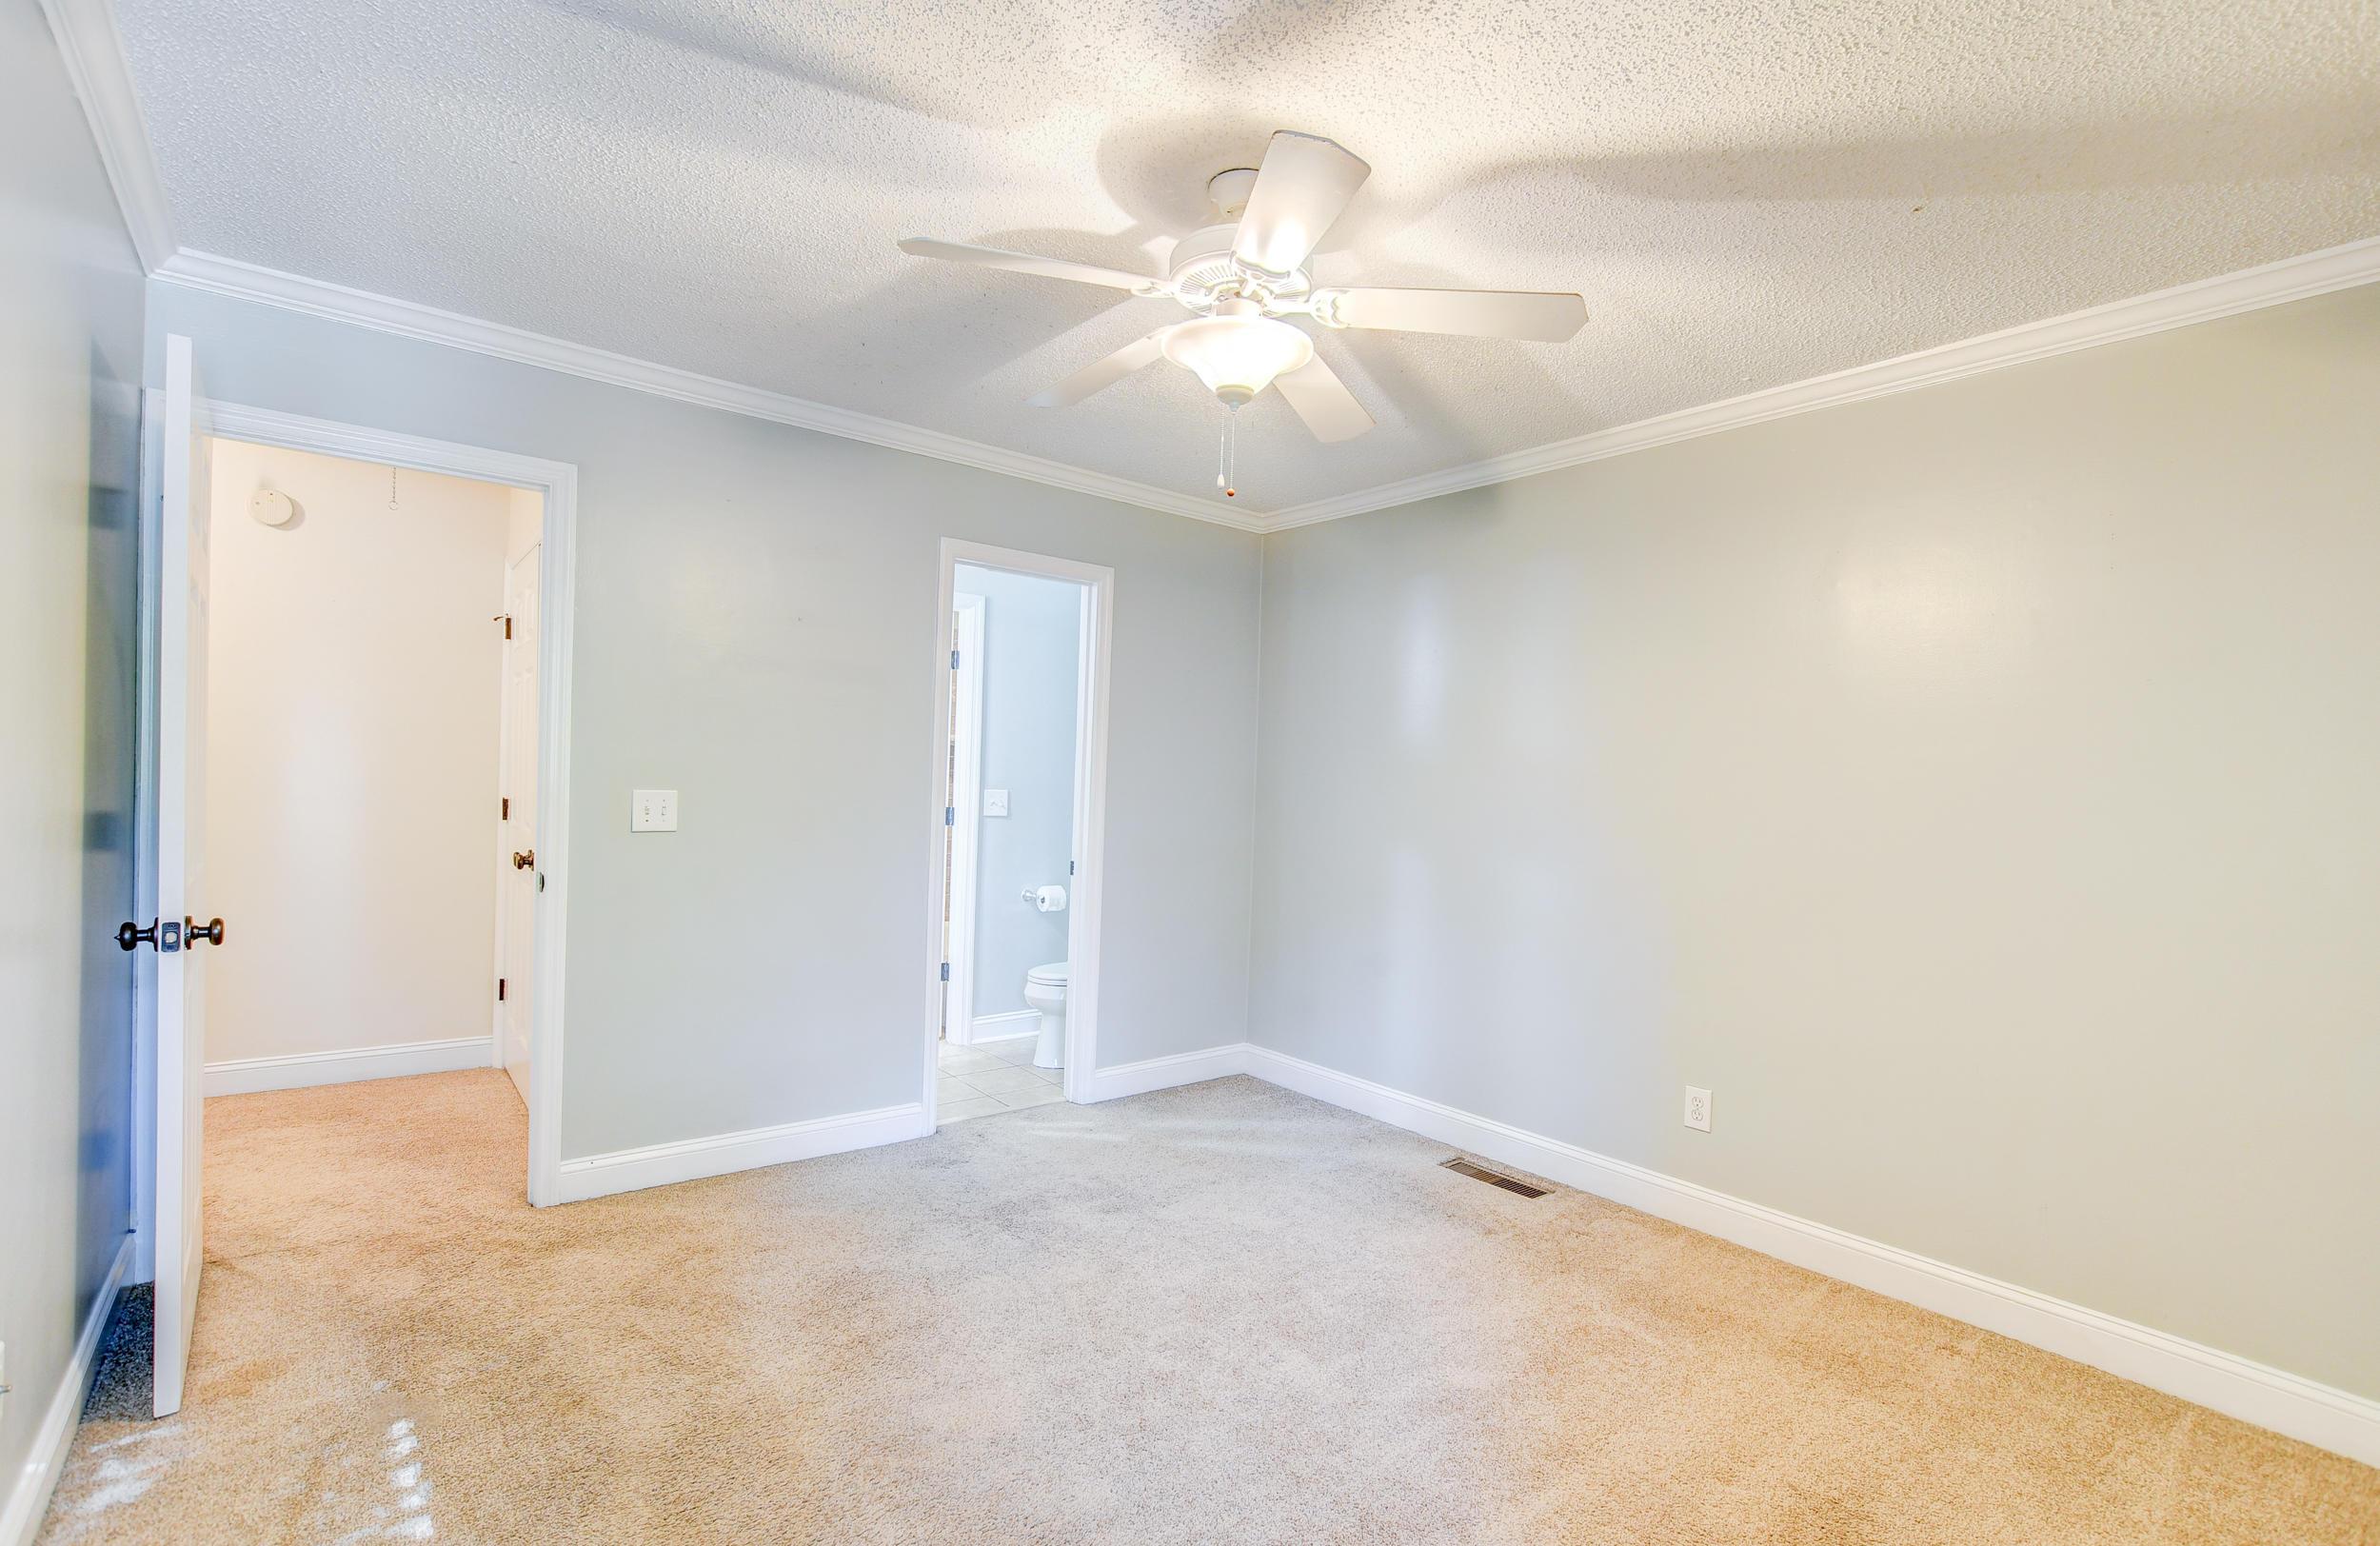 Remington Forest Homes For Sale - 1334 Cassidy, Mount Pleasant, SC - 21